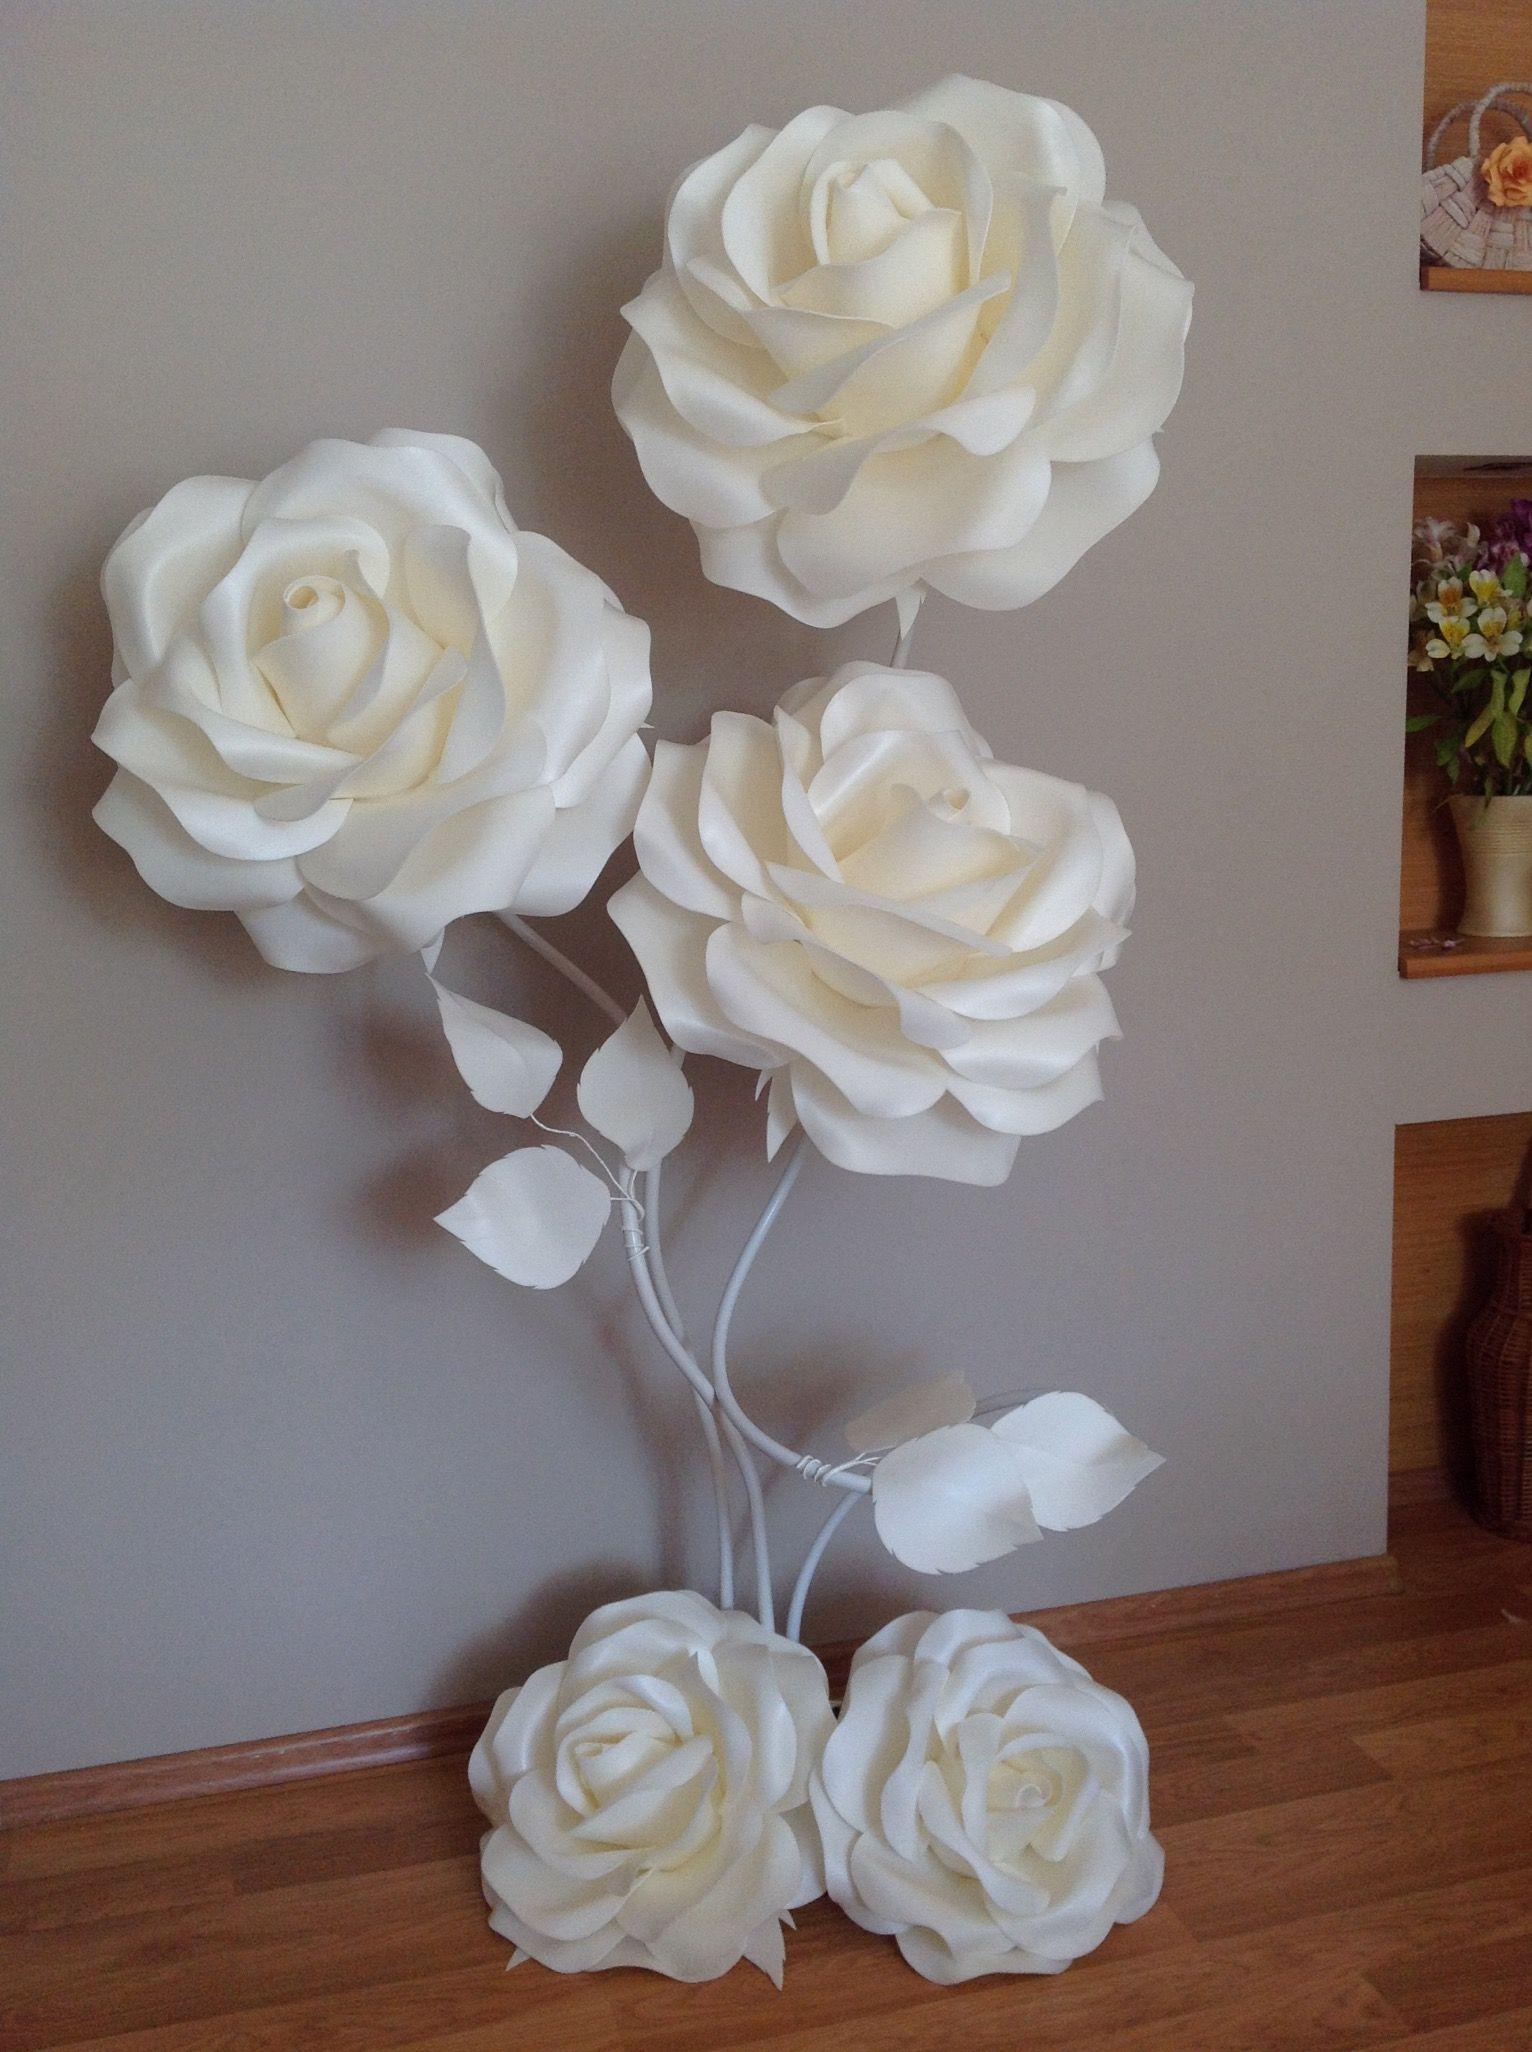 Mariya Sobeshkevich  Cosas que adoro  Pinterest  Pin pin Flowers